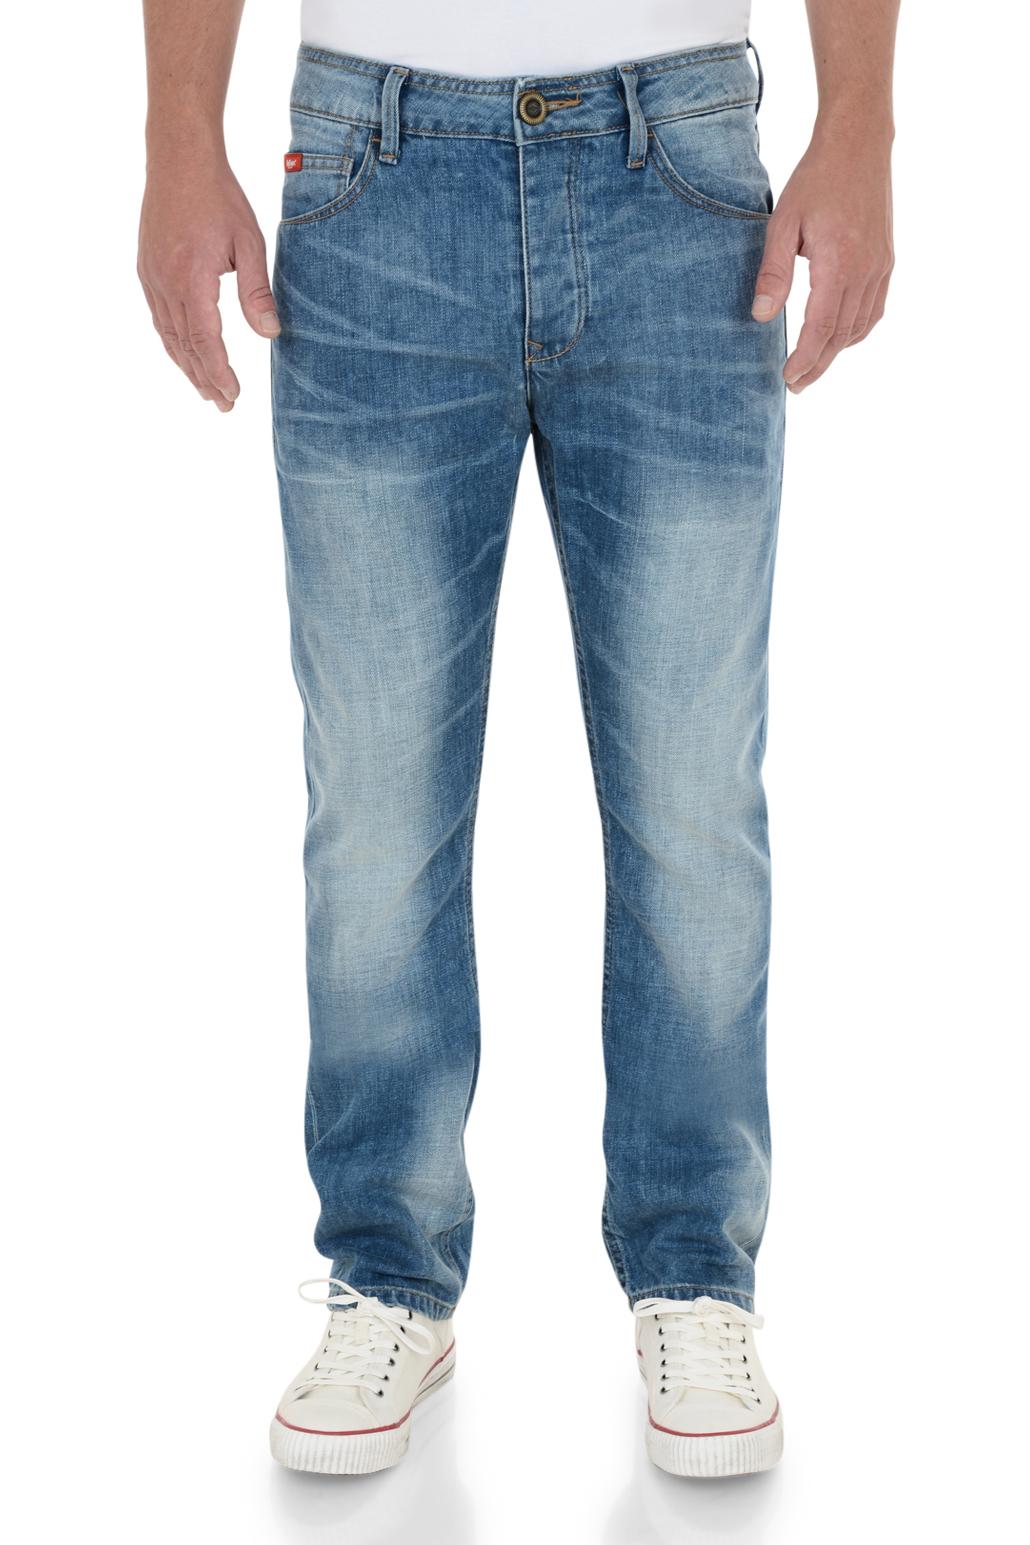 lee cooper jeans men�s new vintage faded denim pants